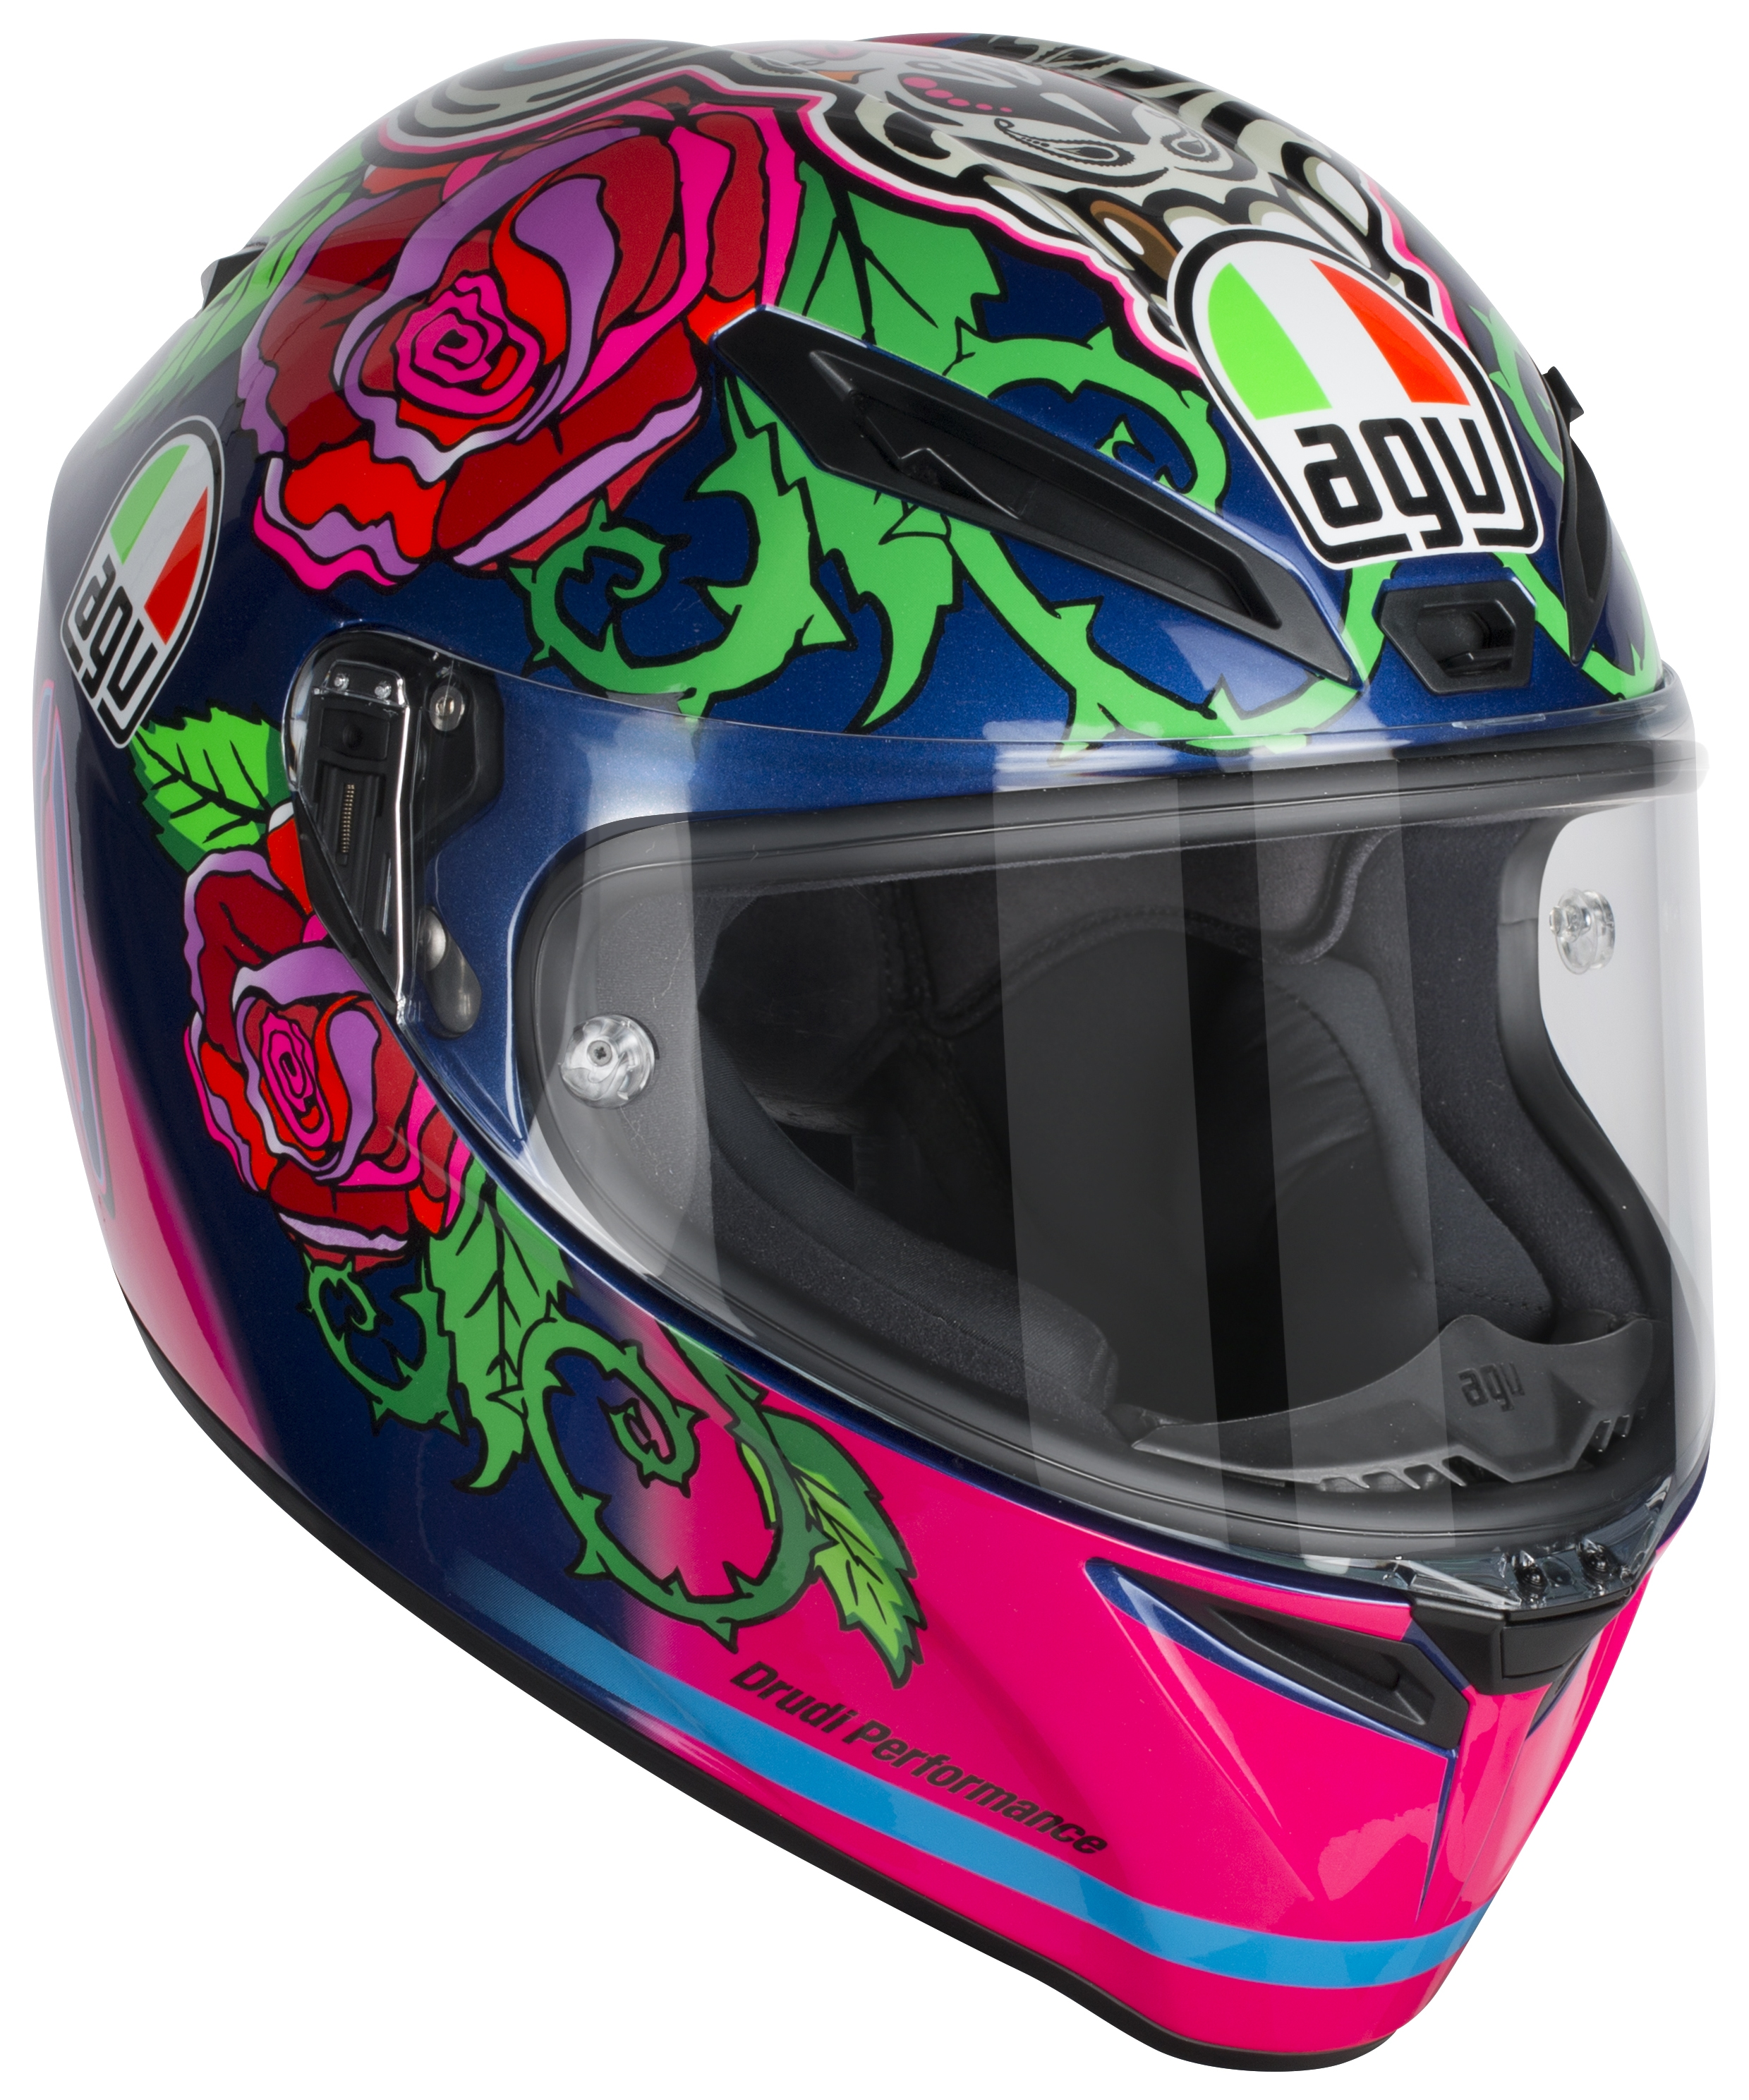 AGV Horizon Racer Helmet - RevZilla